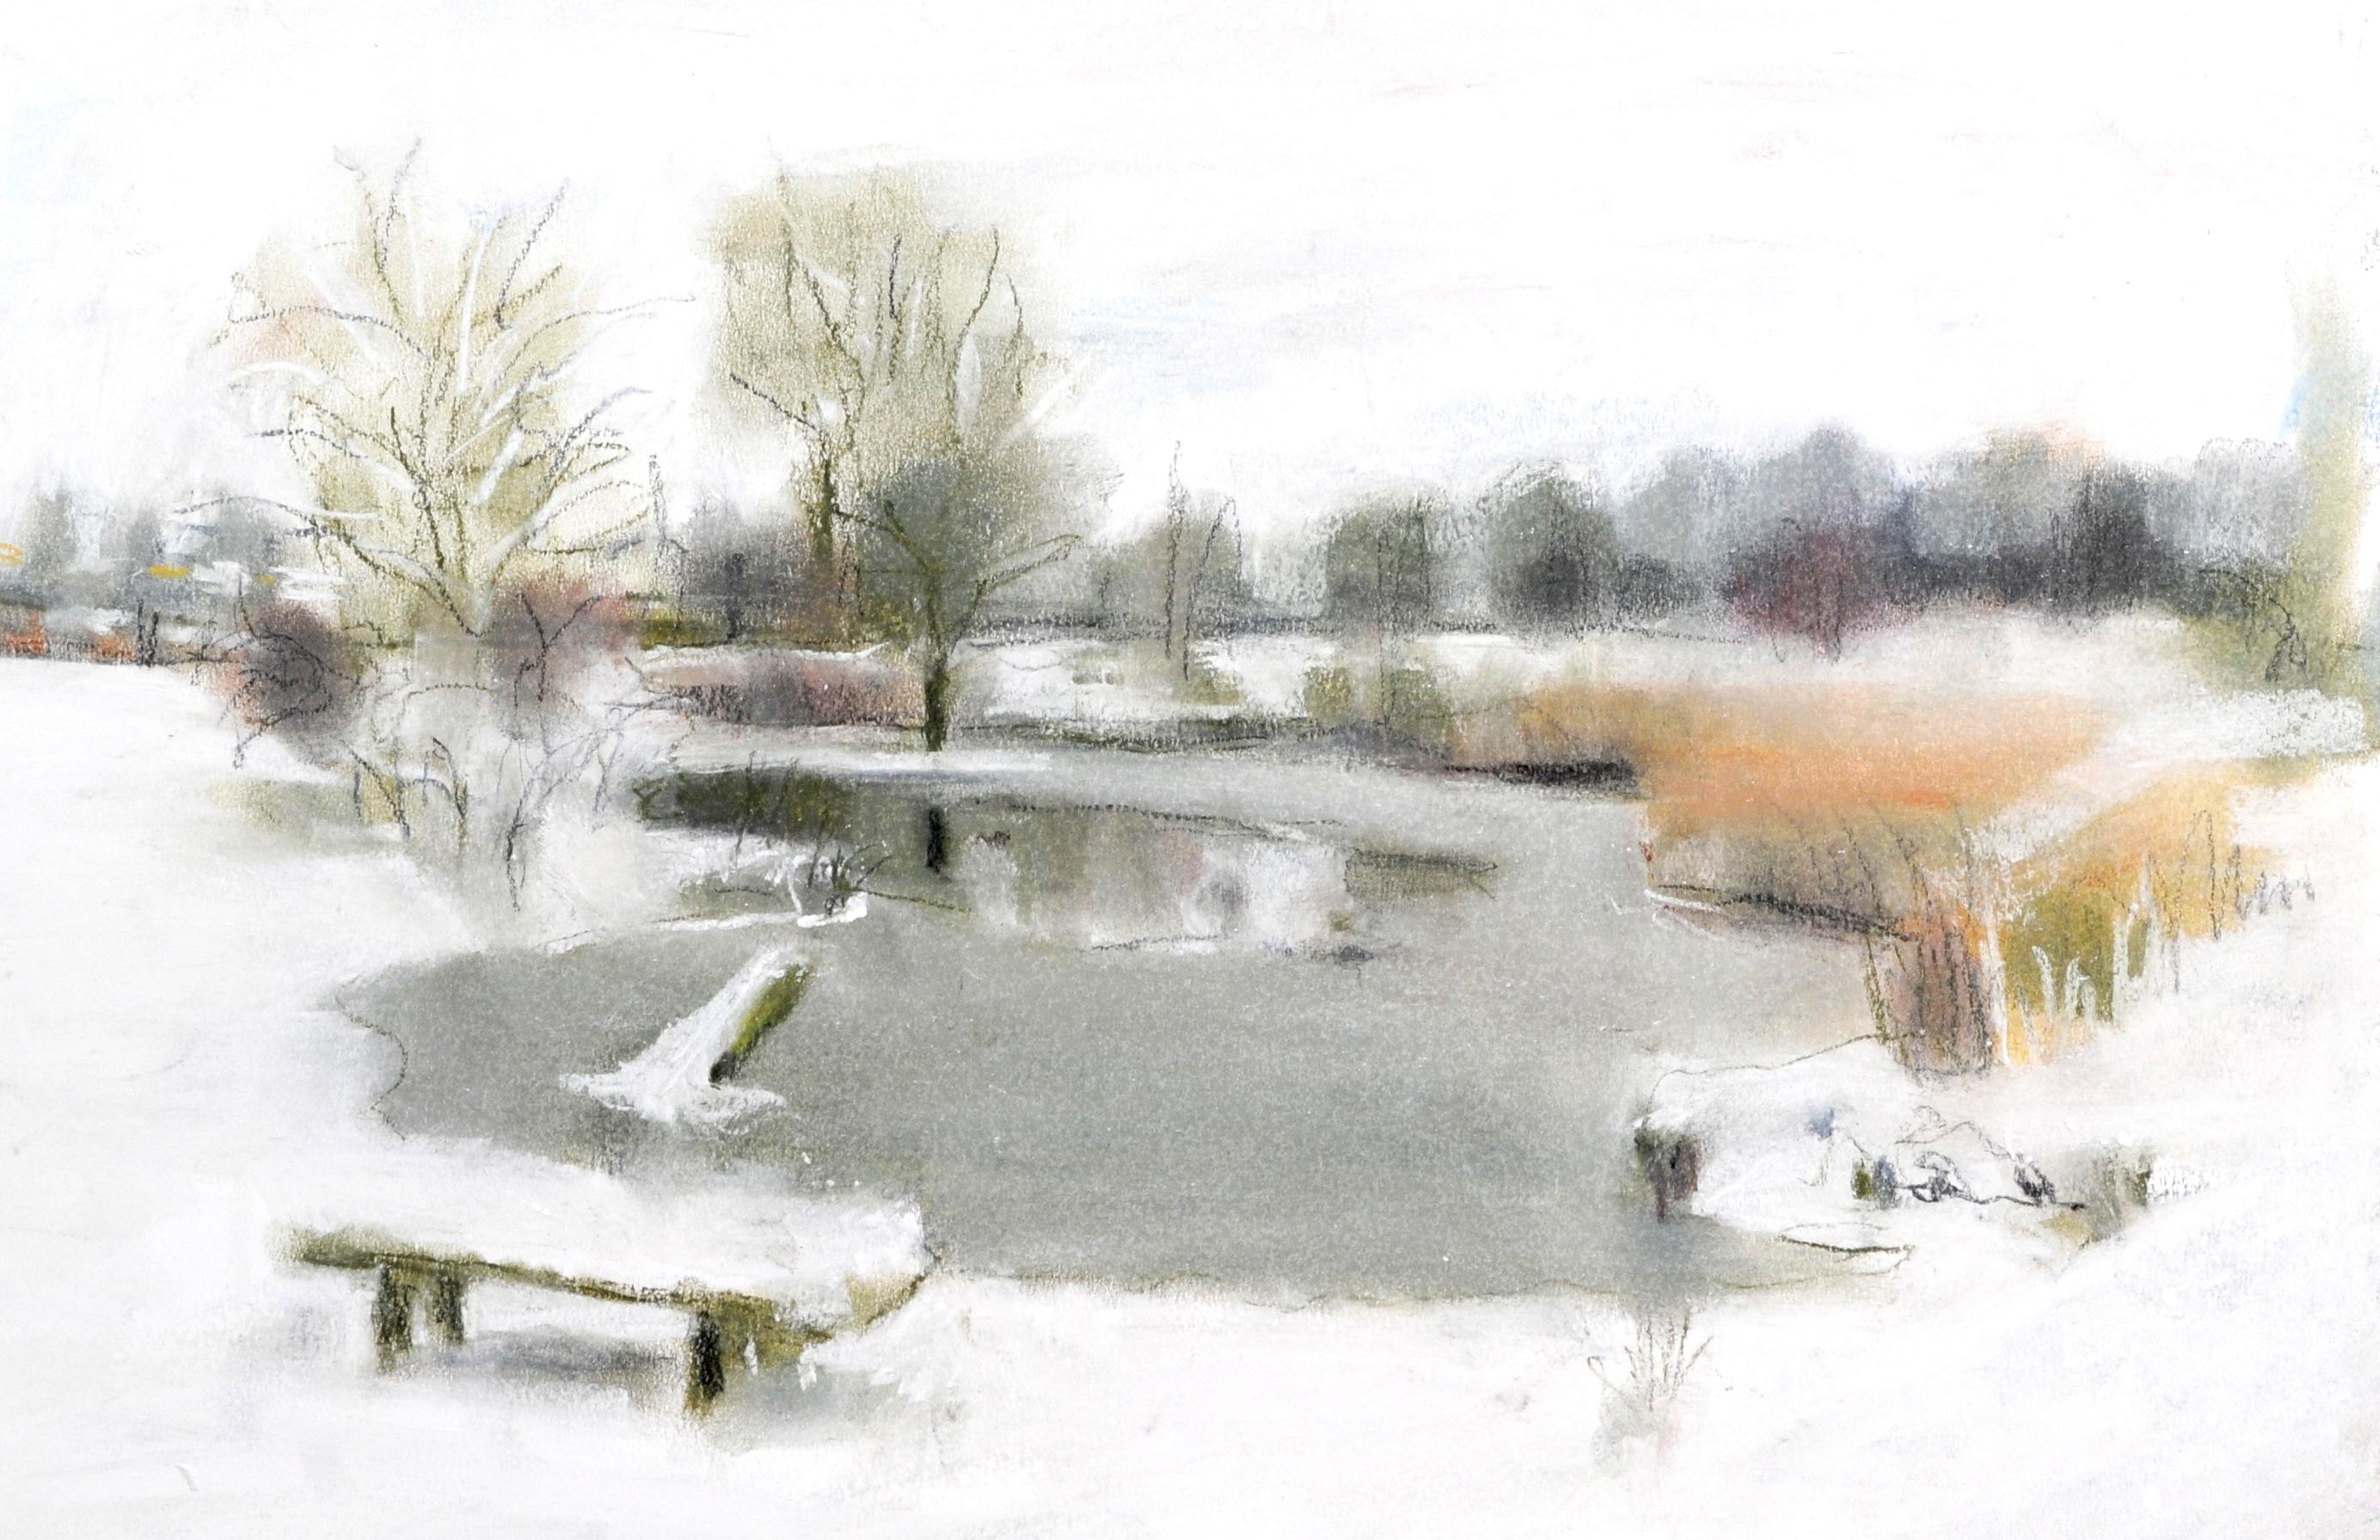 Sutcliffe Park Pond, Winter